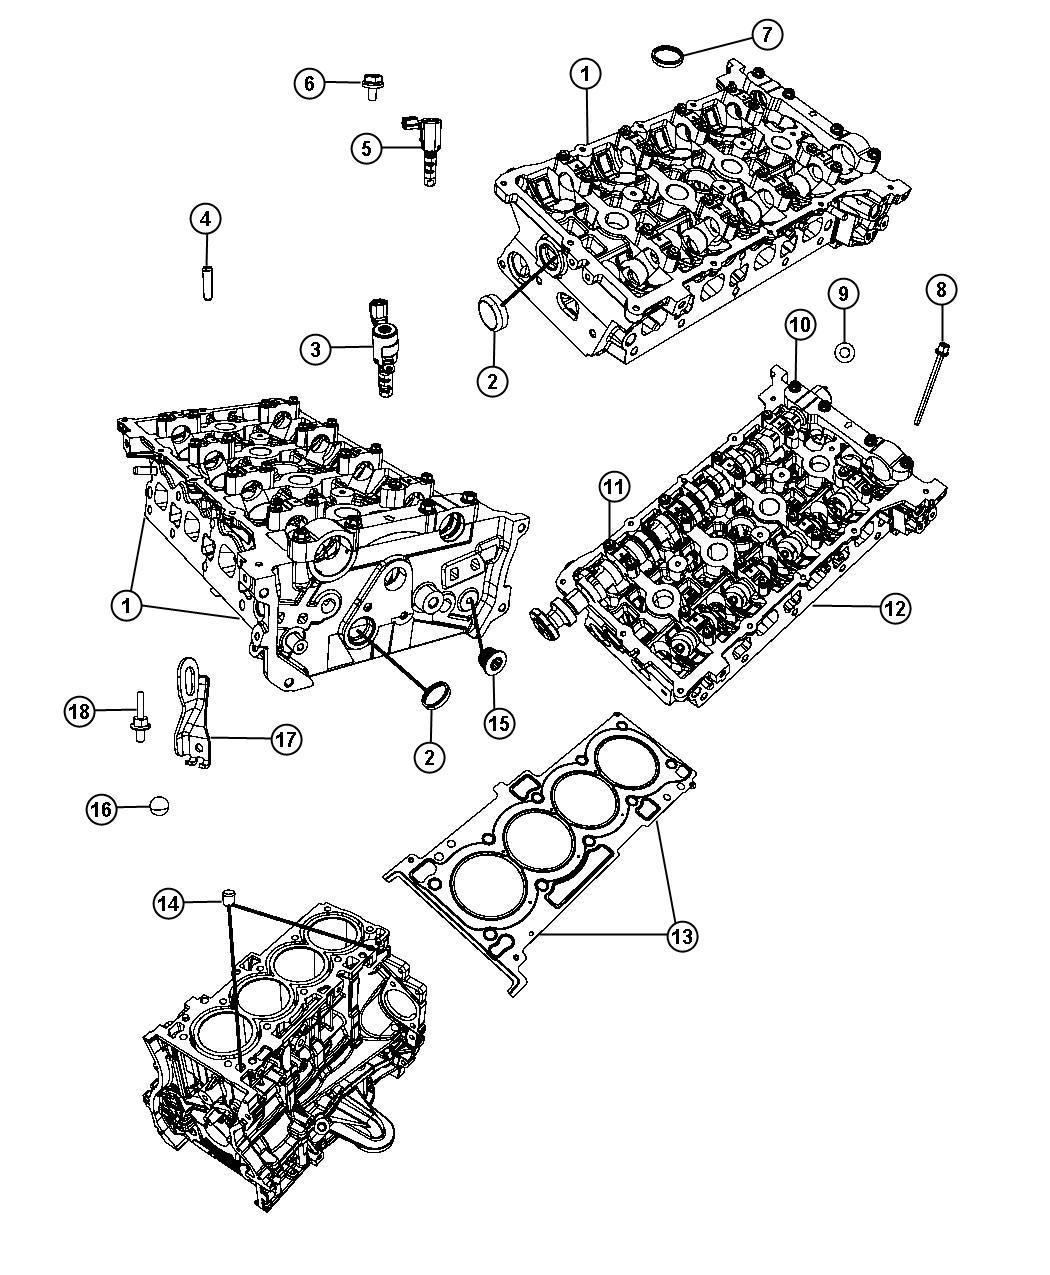 Dodge Caliber Plug. Core. Cylinder block coolant drain